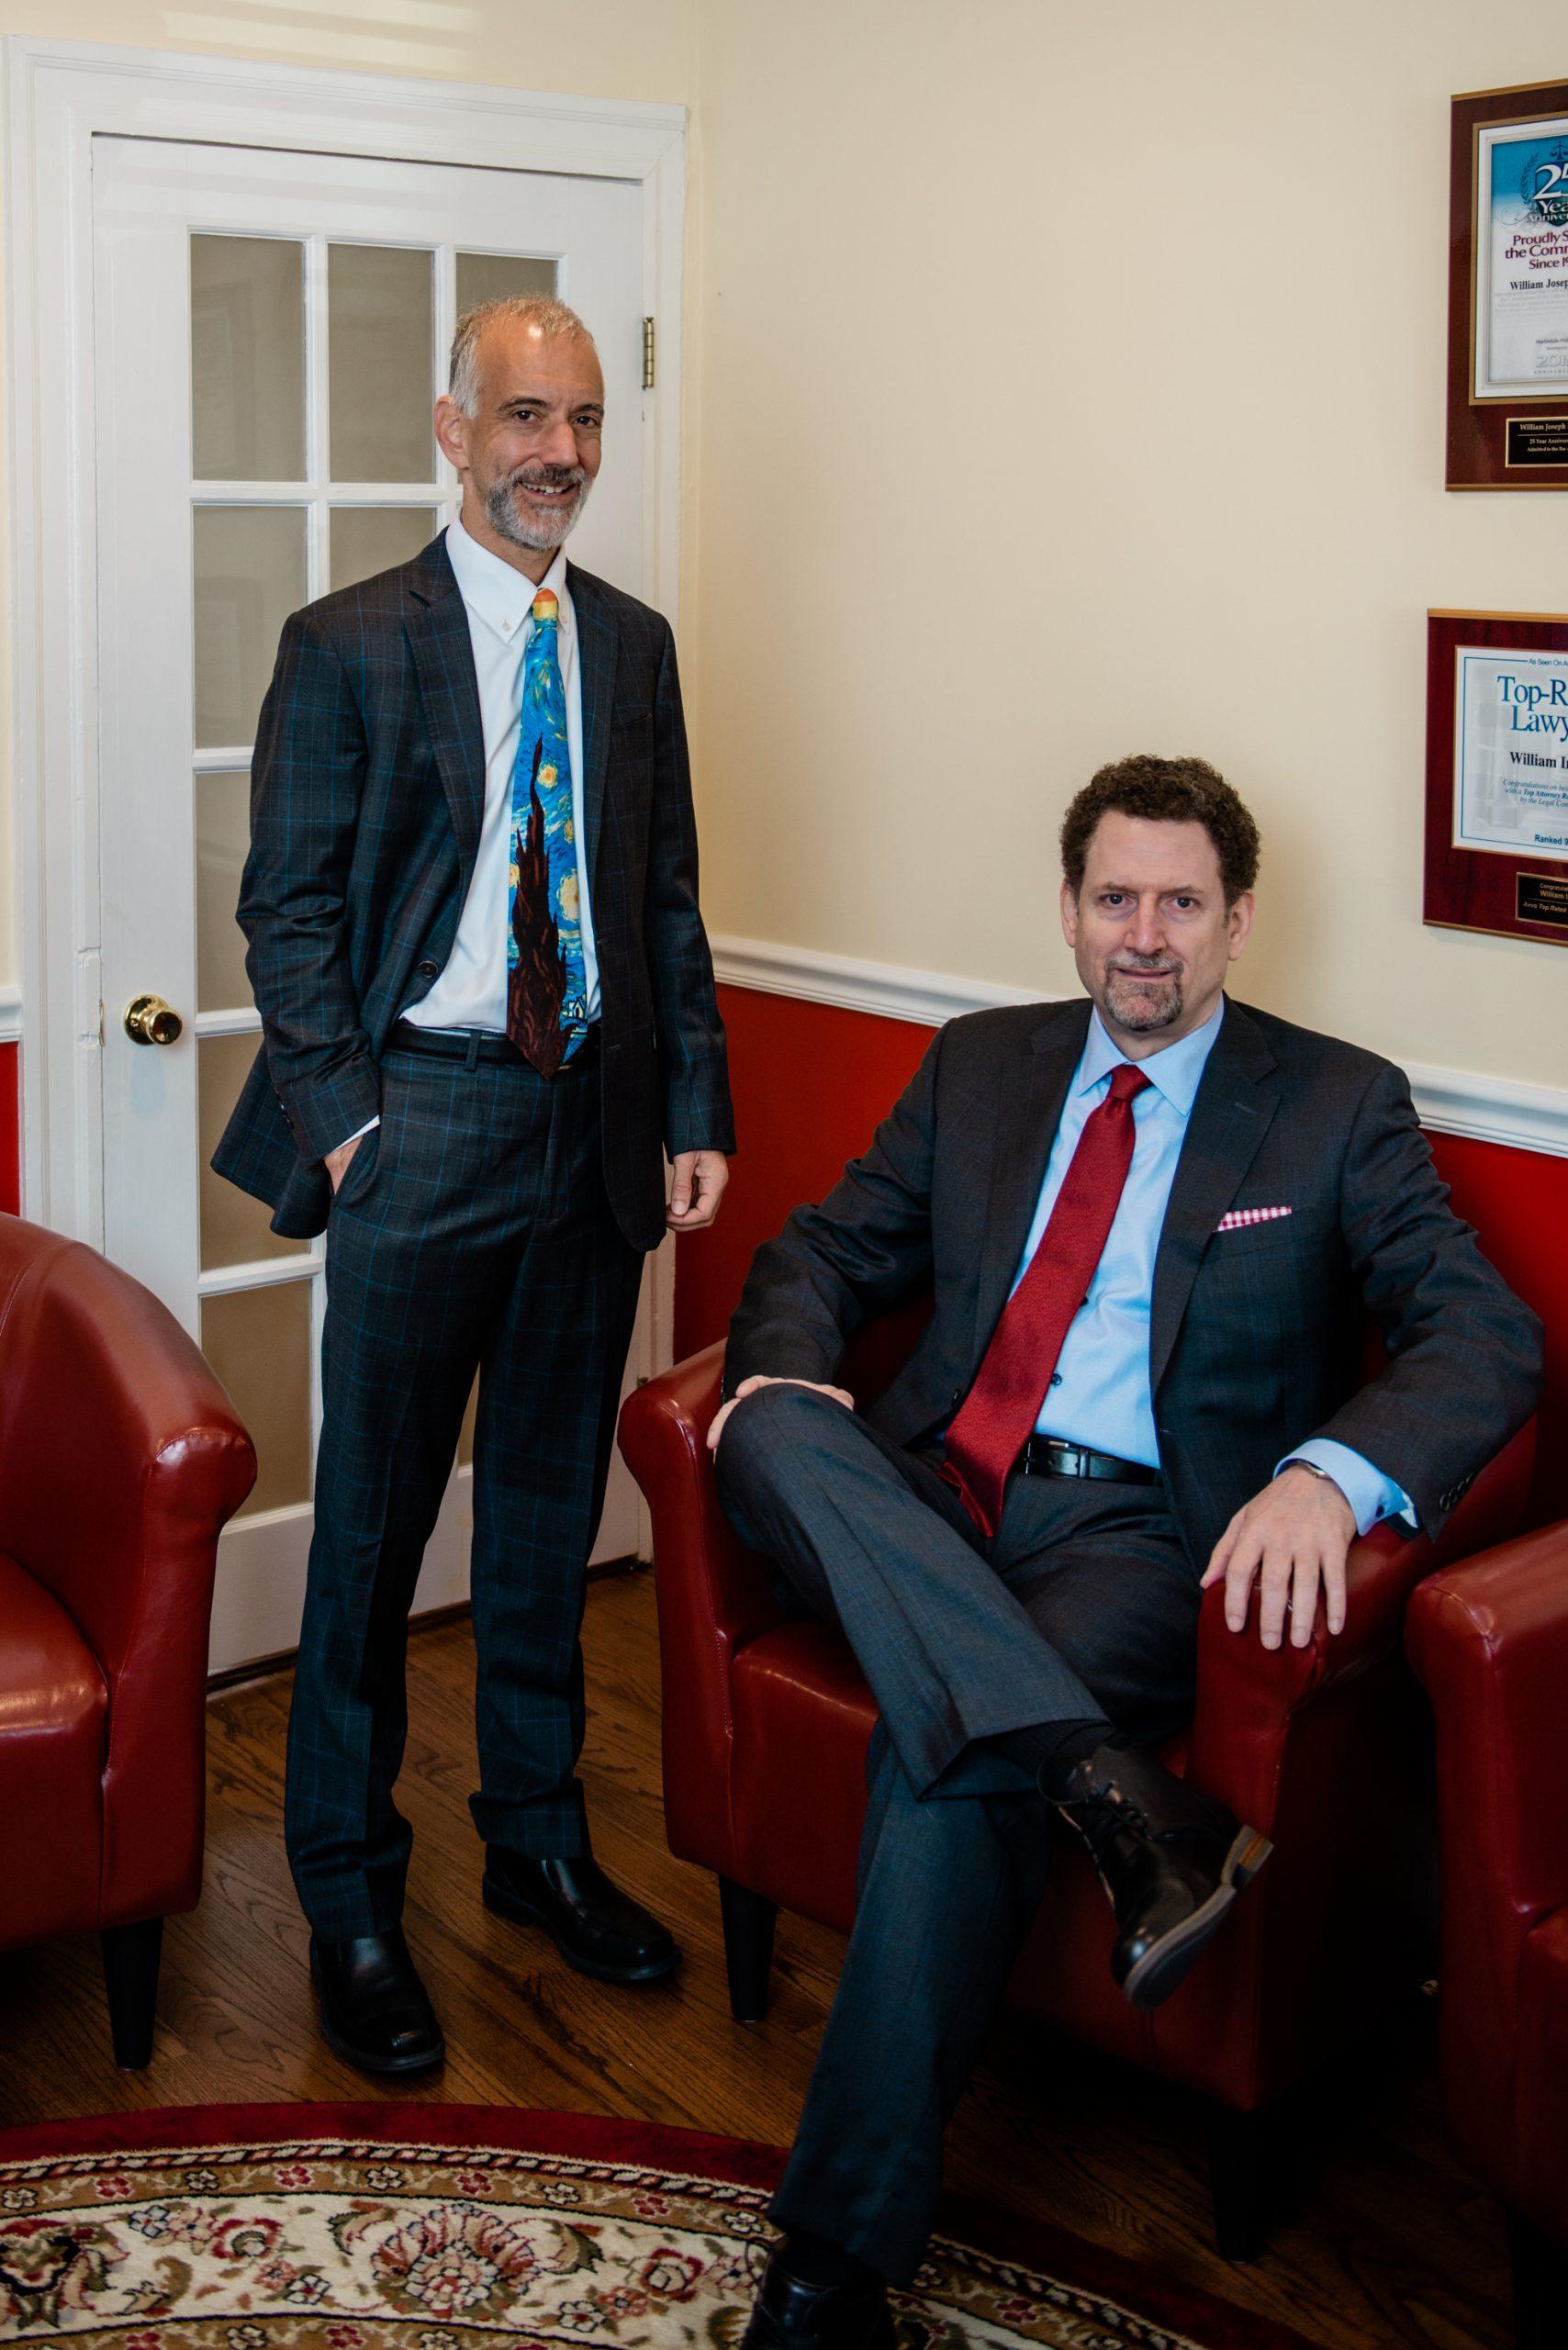 Inman Kaminow Lawyers William J. Inman and David Kaminow